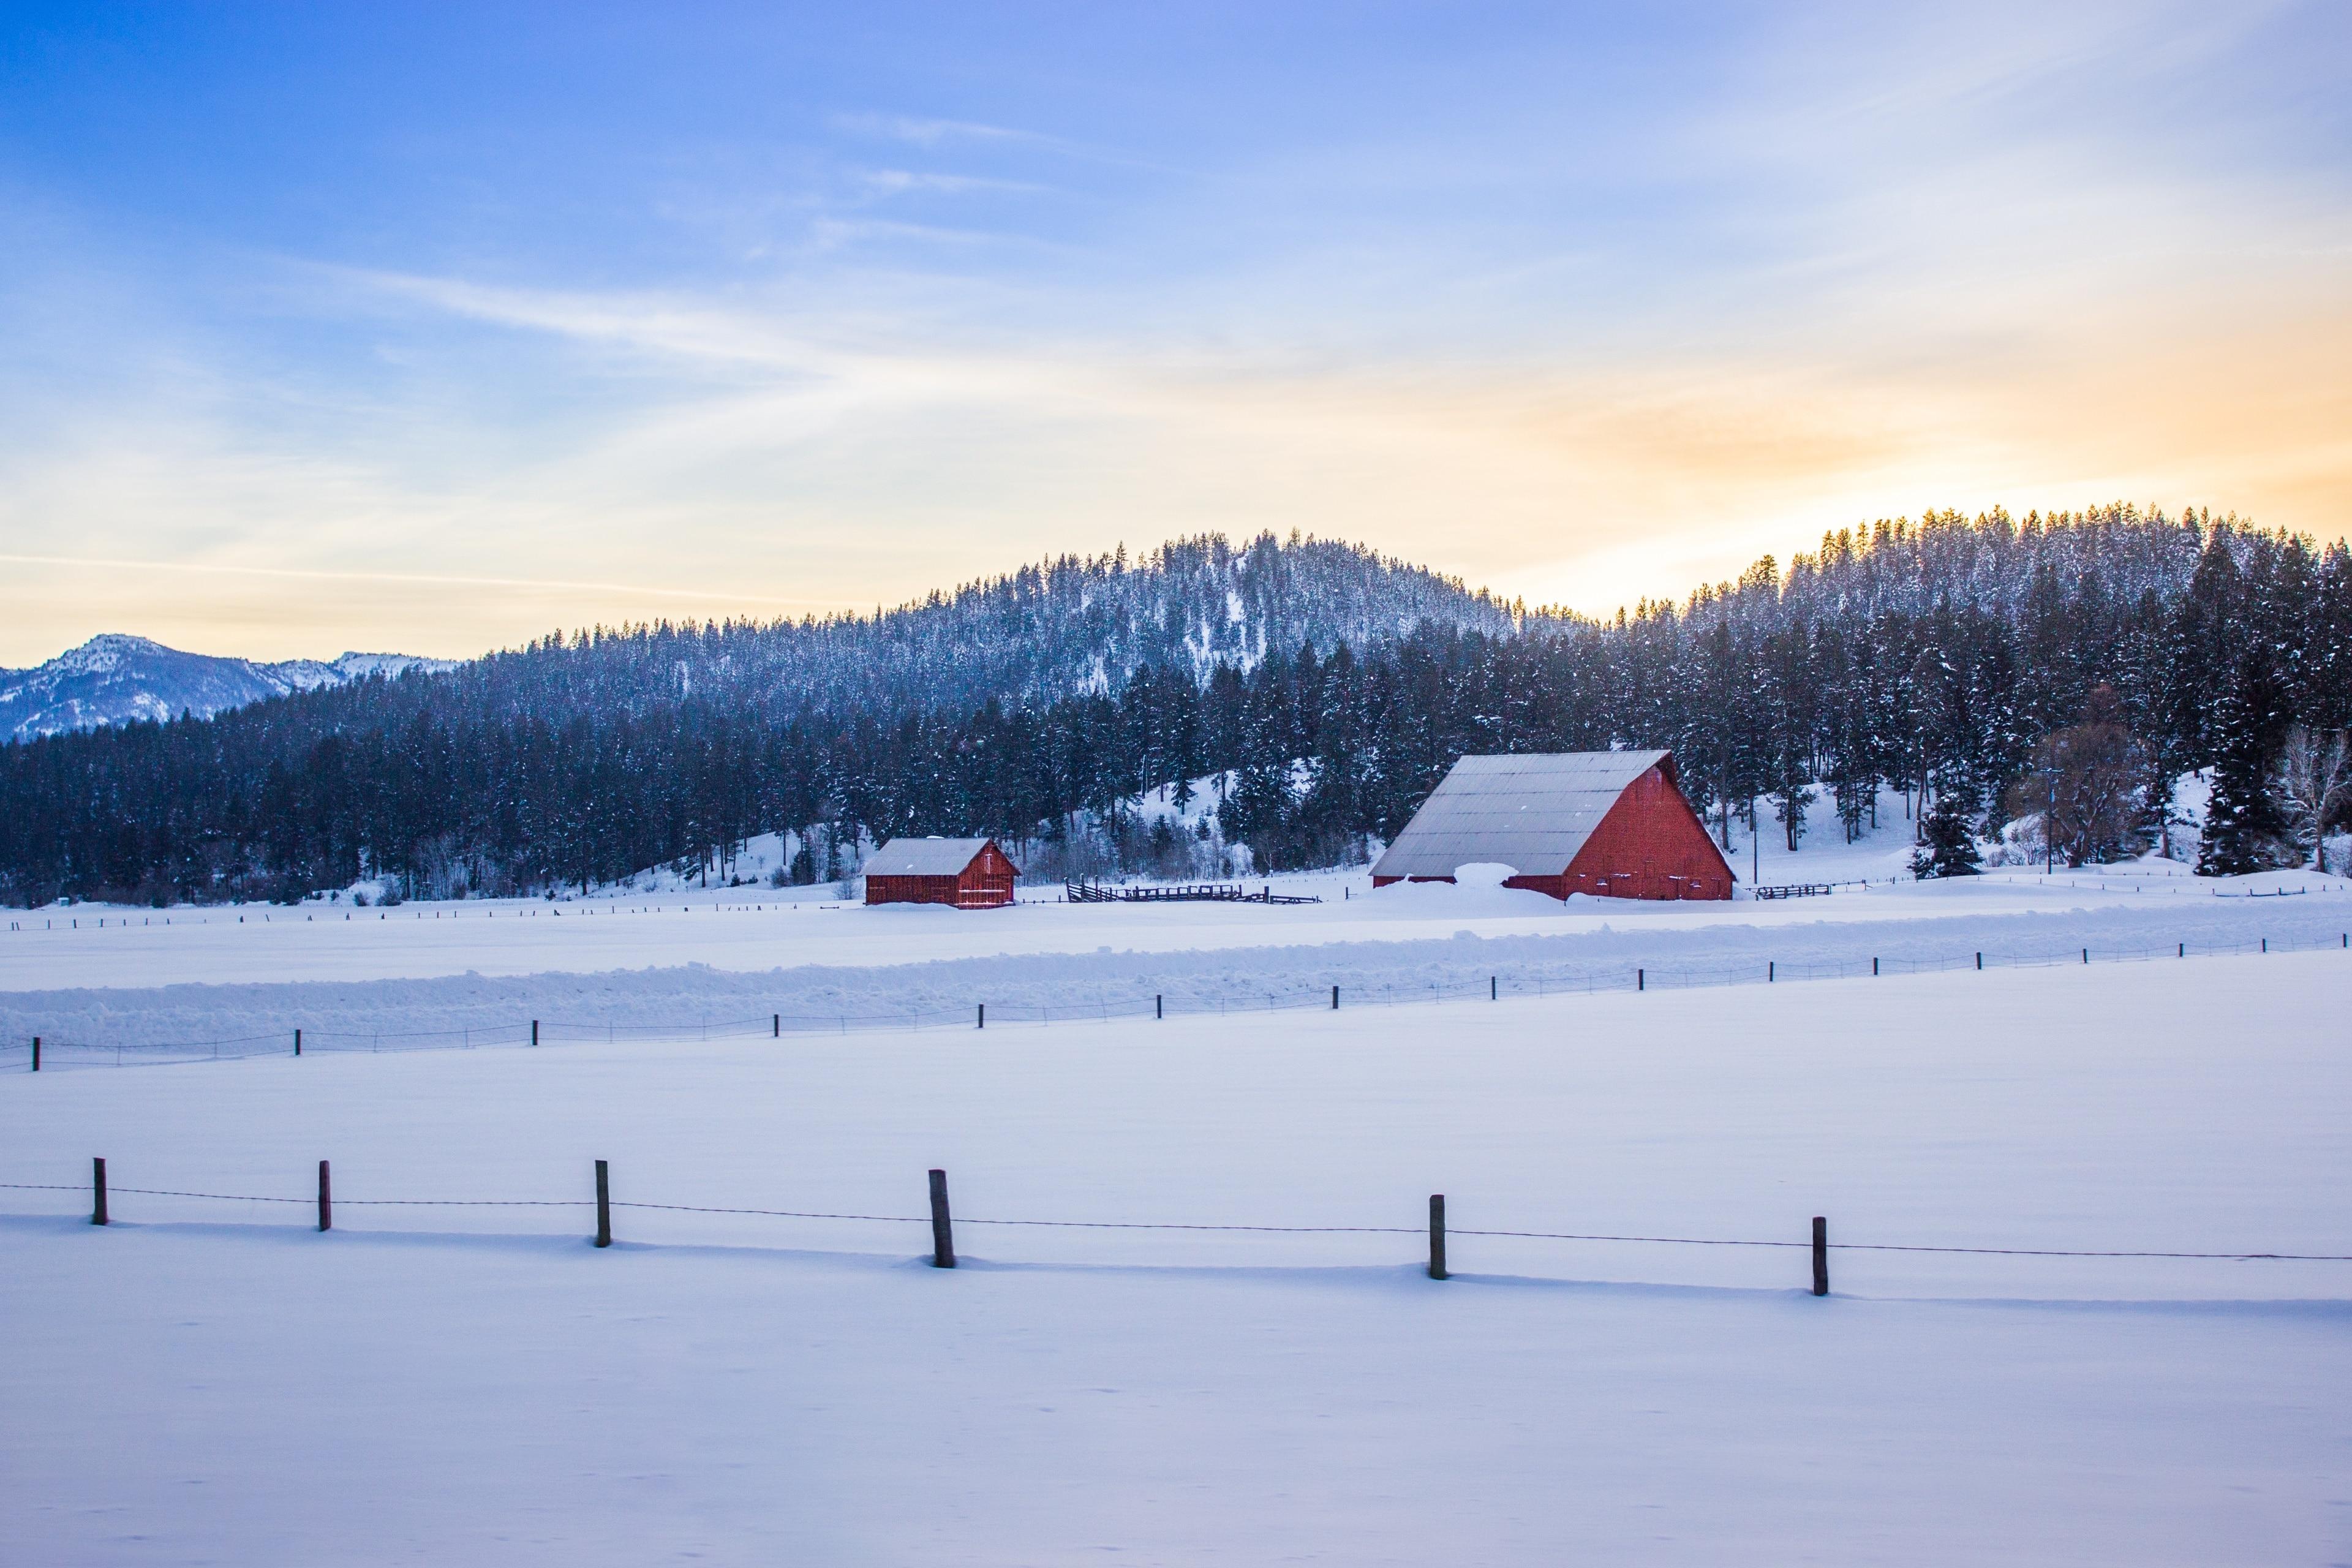 Valley County, Idaho, United States of America